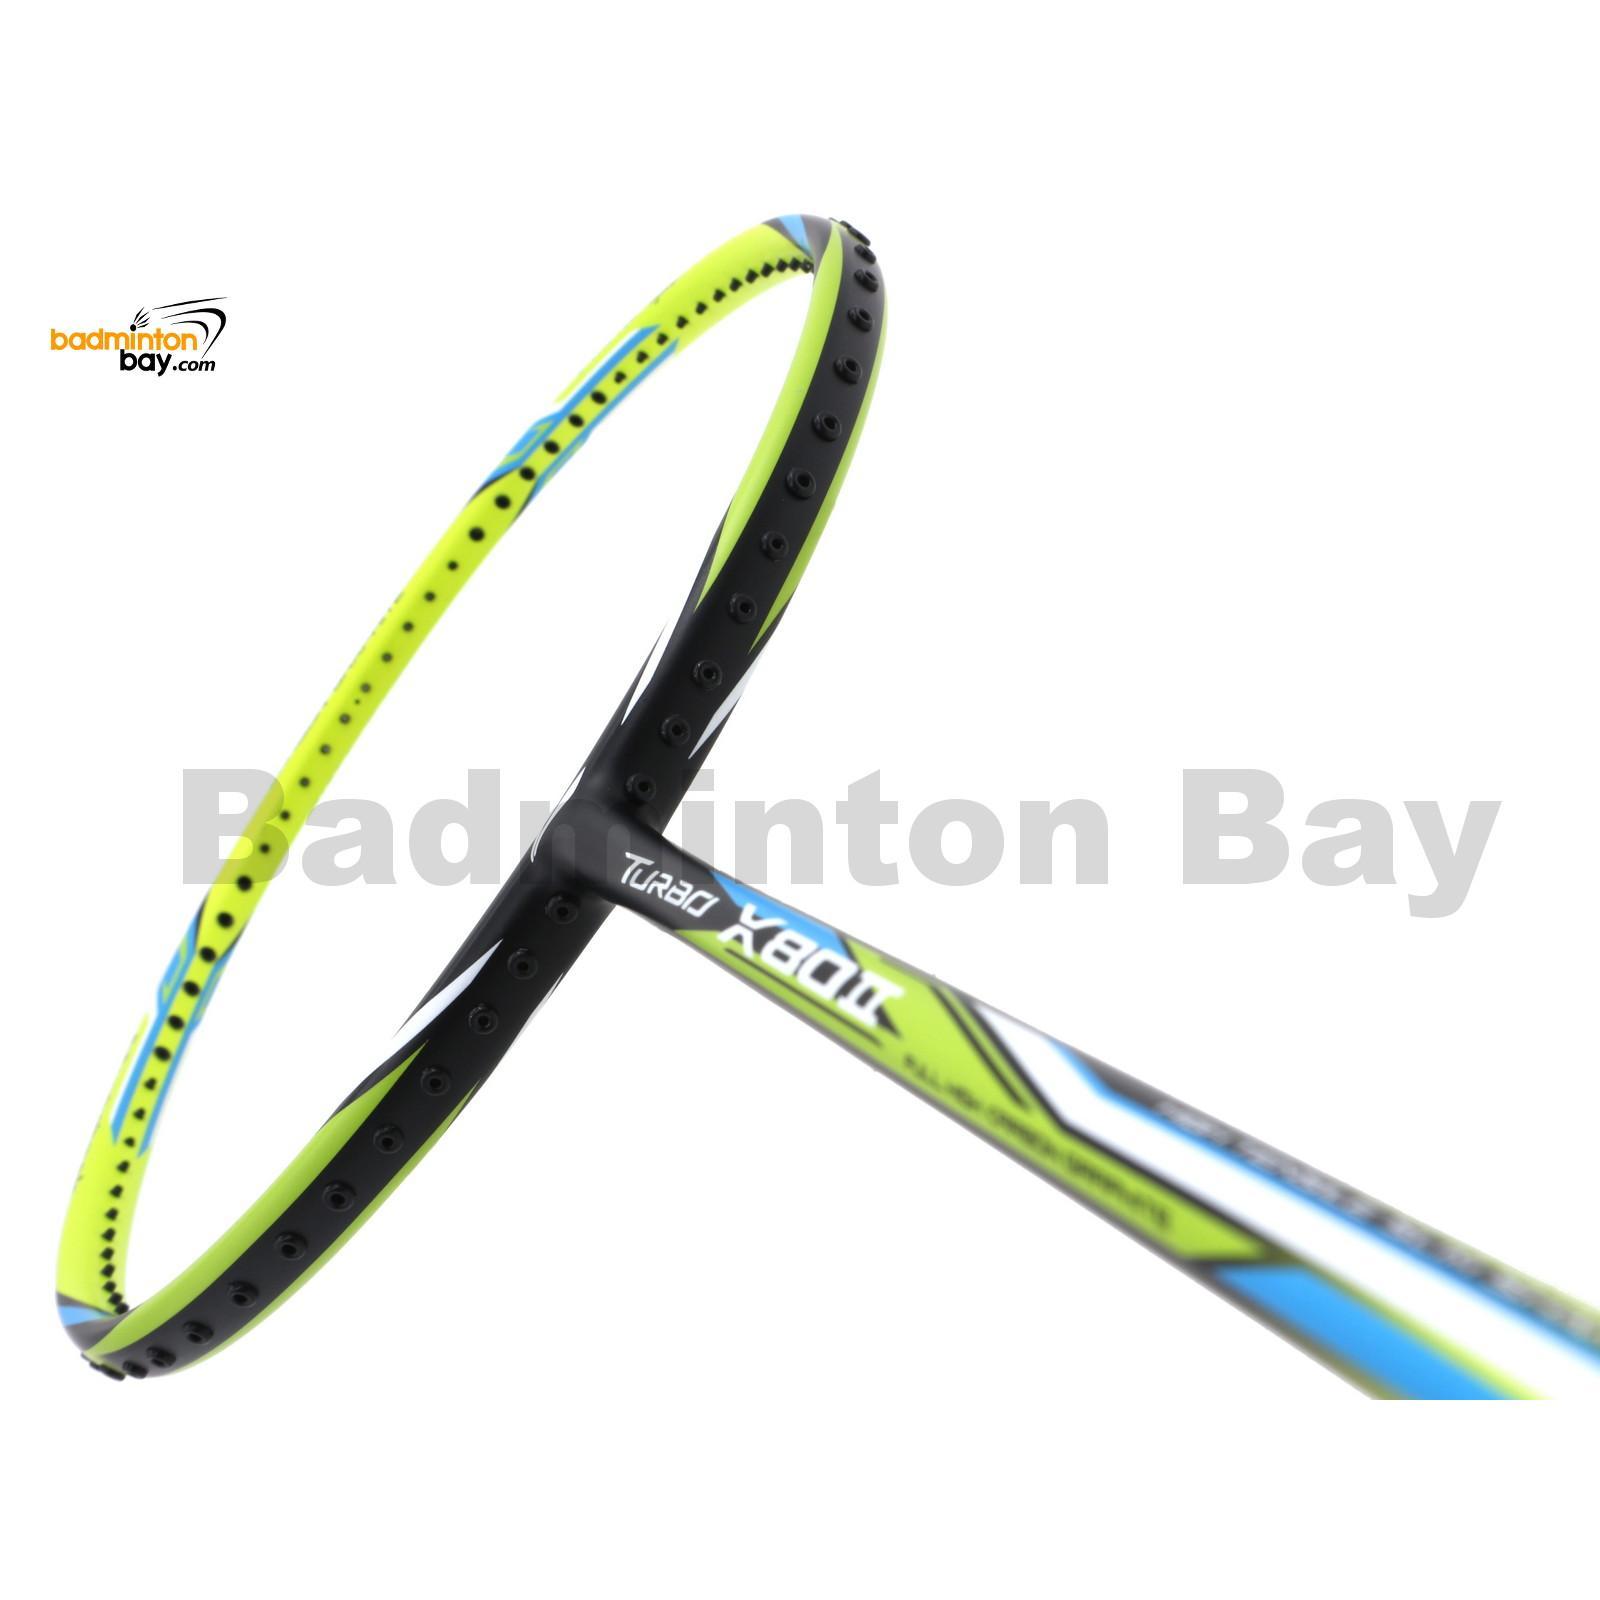 li-ning-turbo-x-80ii-badminton-racket-01-1600x1600.jpg